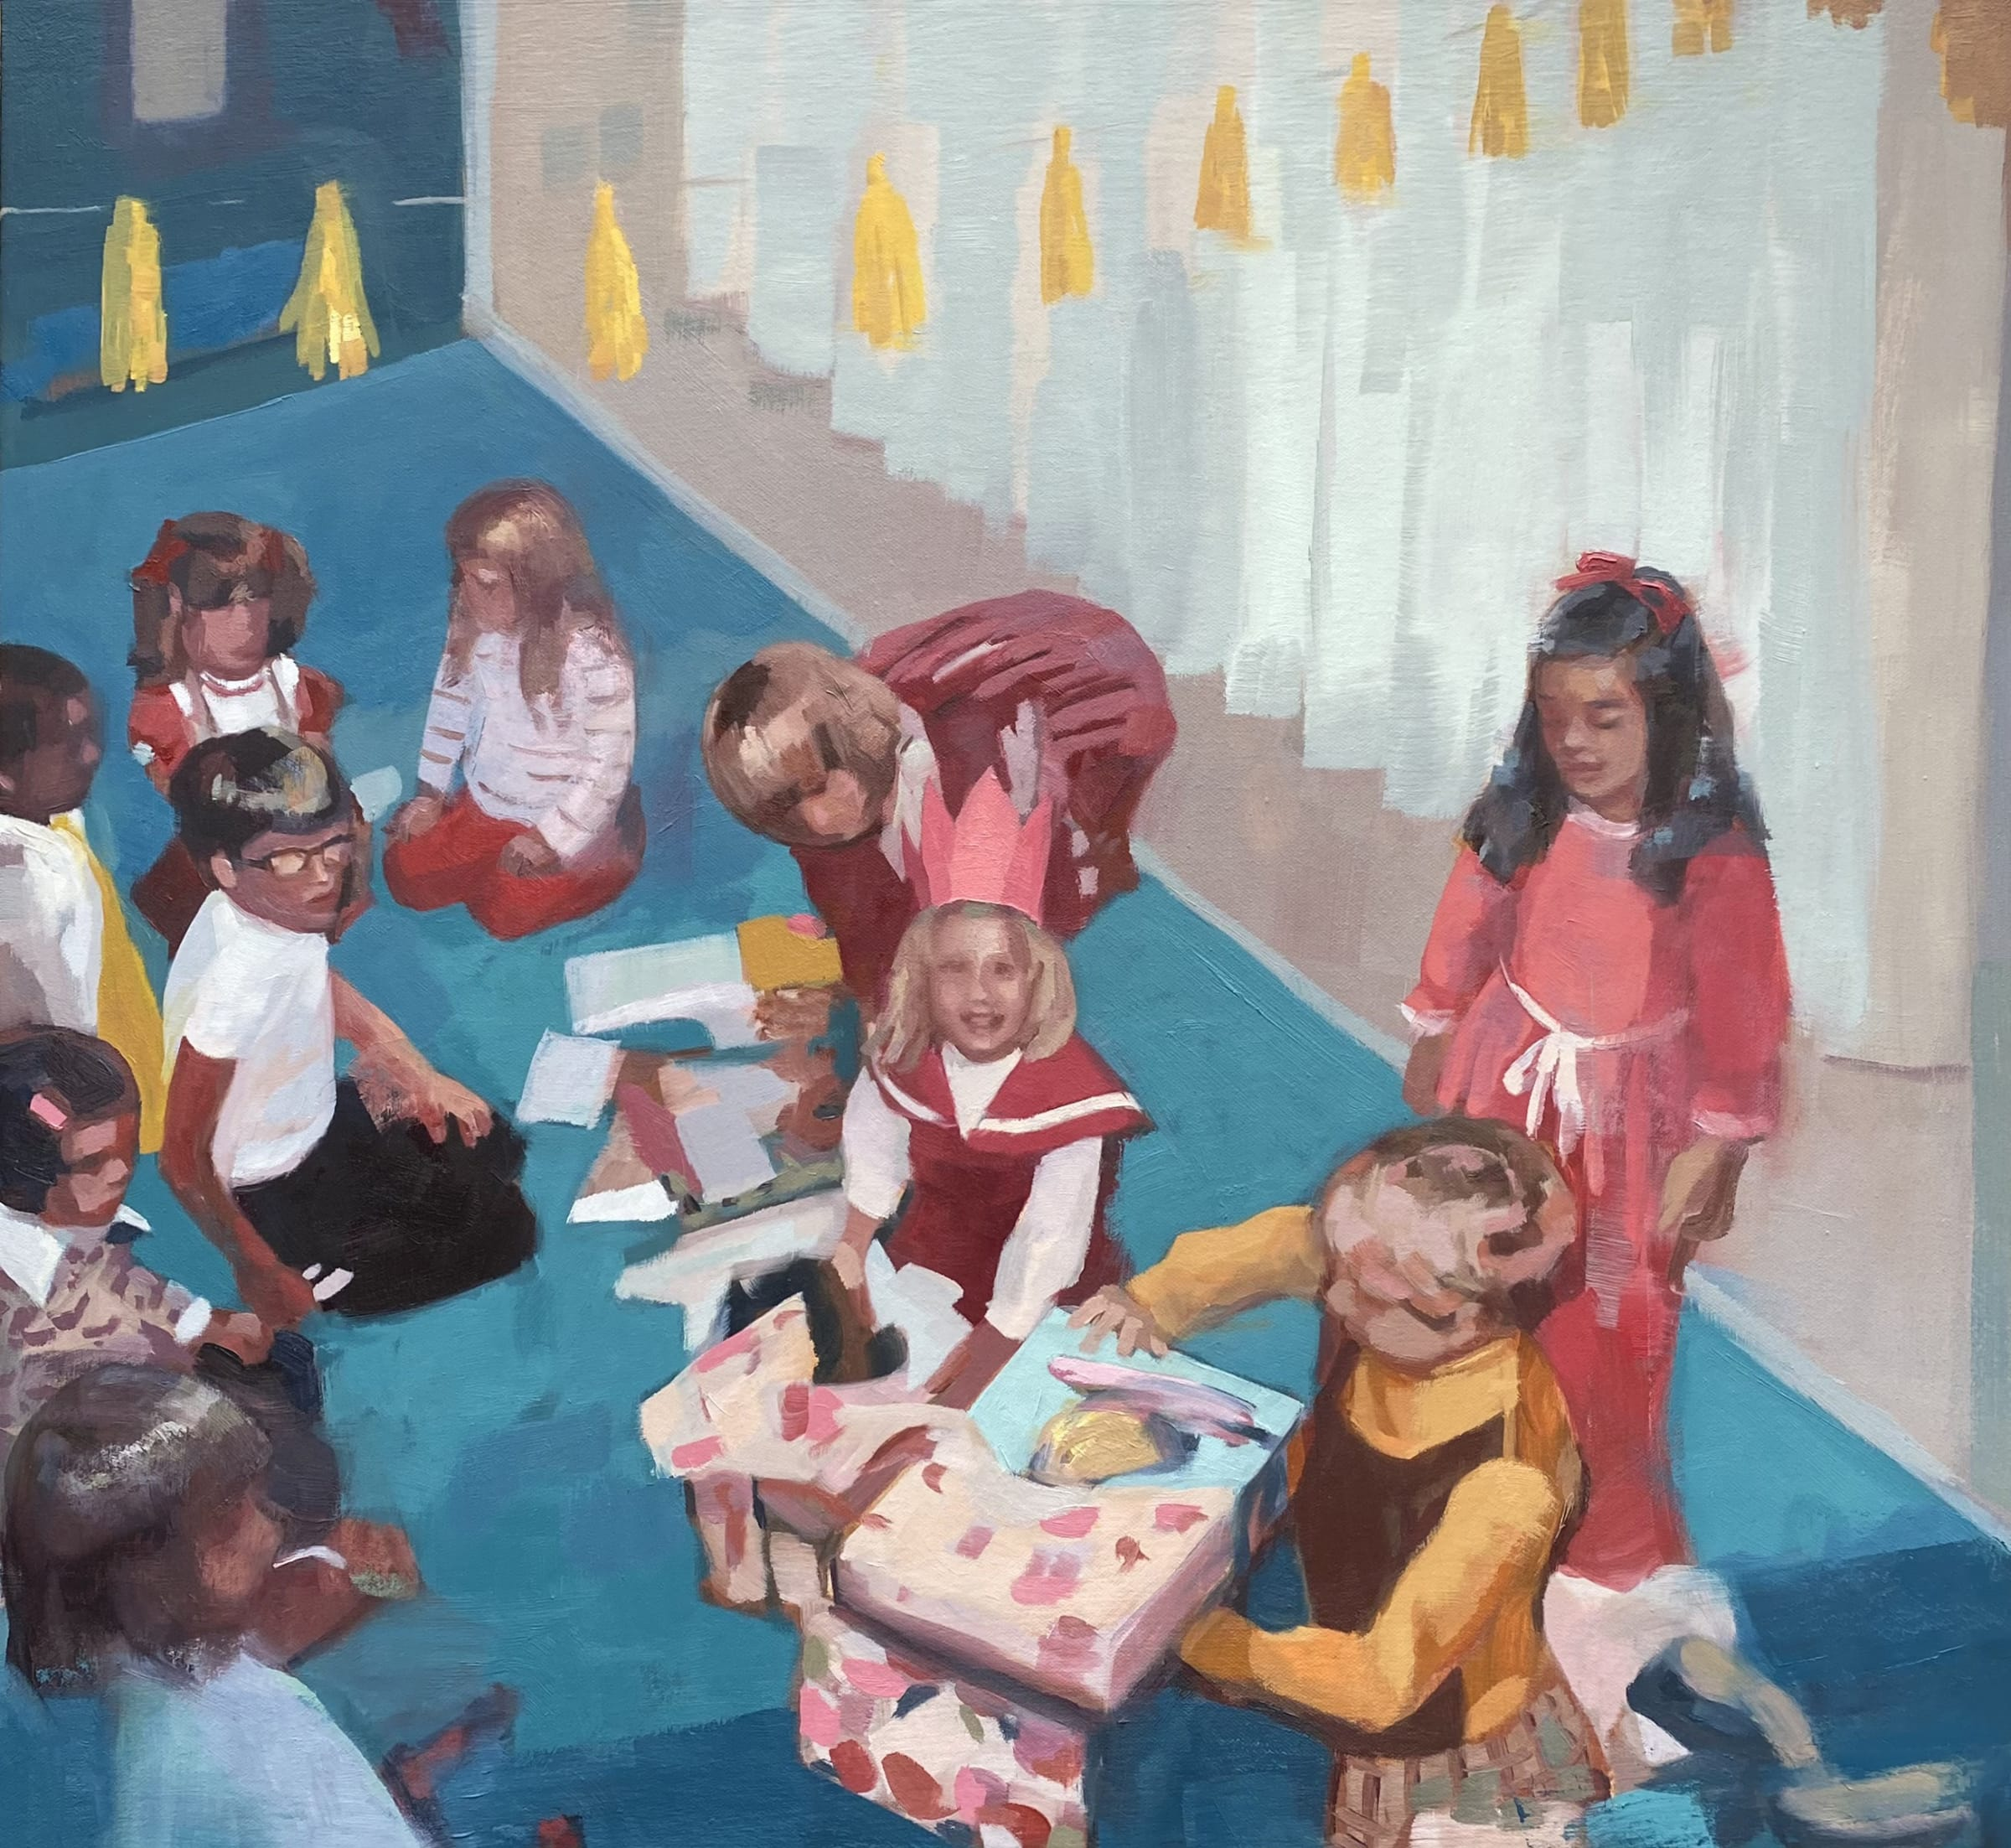 "<span class=""link fancybox-details-link""><a href=""/artists/89-kirsten-tradowsky/works/1418-kirsten-tradowsky-presents/"">View Detail Page</a></span><div class=""artist""><strong>Kirsten Tradowsky</strong></div> <div class=""title""><em>Presents</em></div> <div class=""medium"">Oil on canvas</div> <div class=""dimensions"">22 x 24 inches</div>"